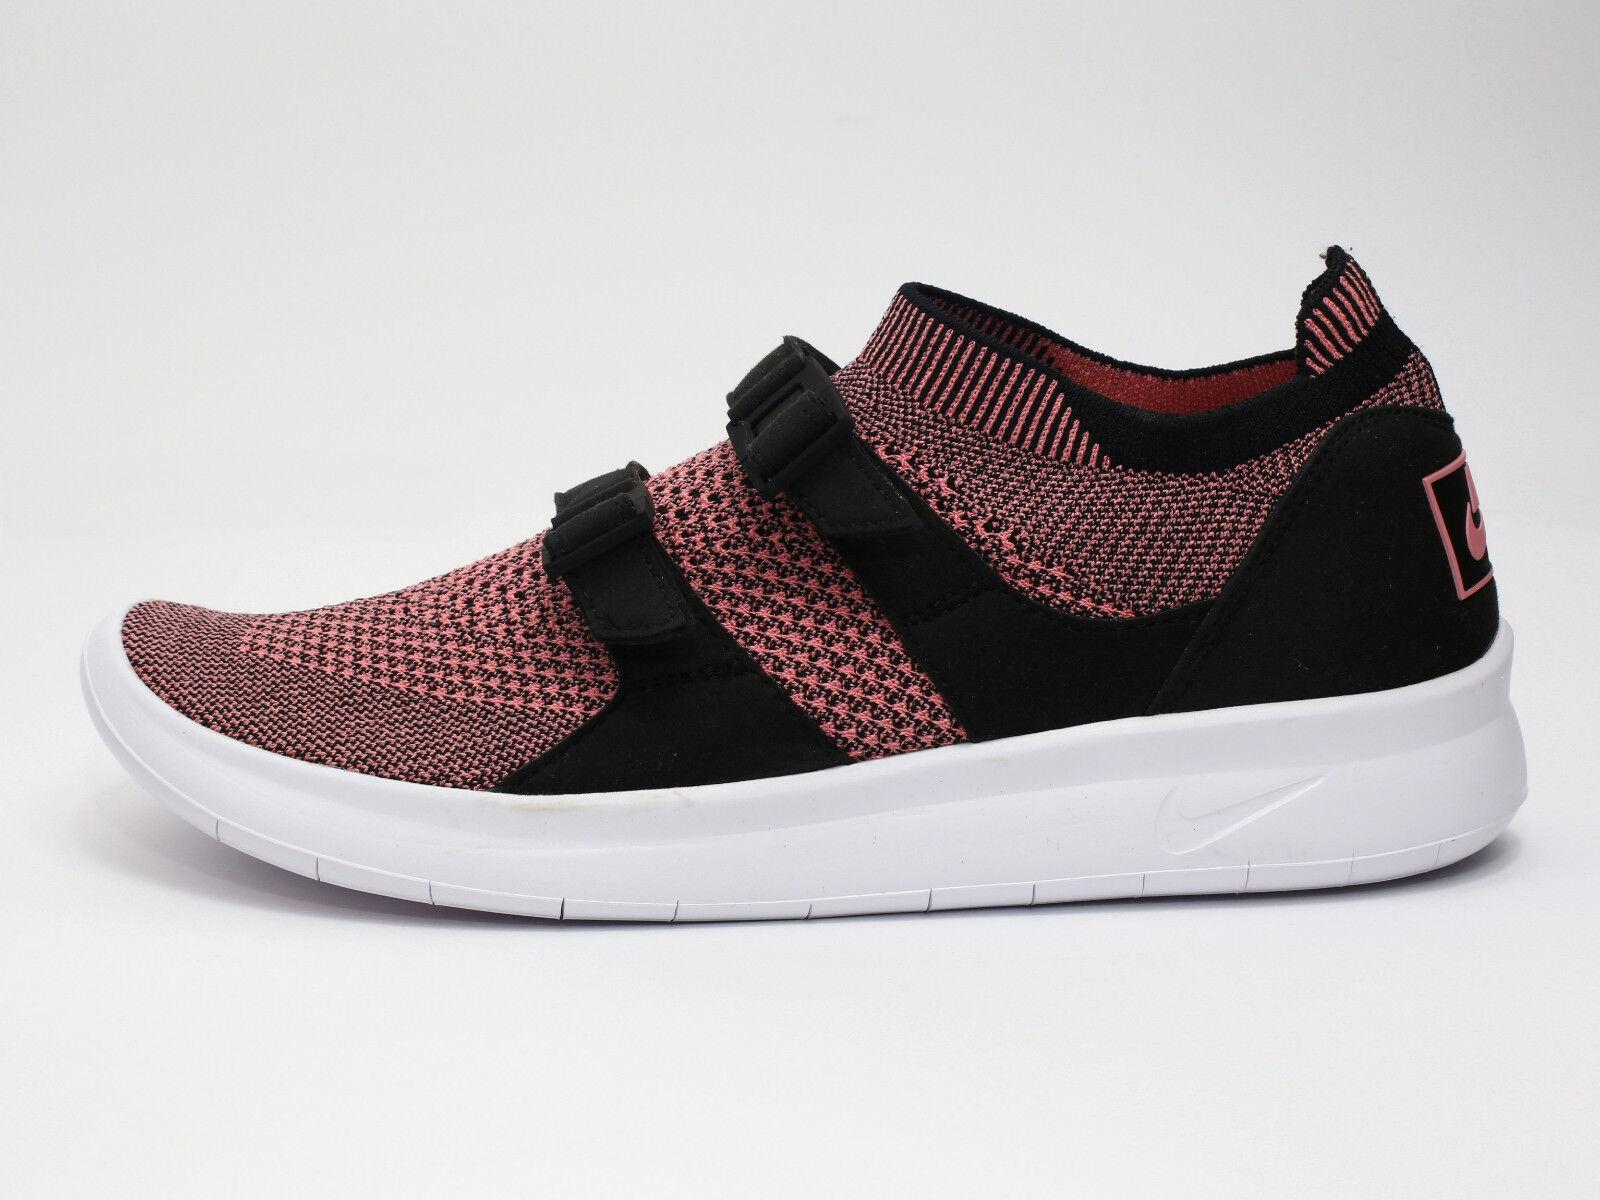 Nike Air Sockracer Flyknit (898022-003) Herren Sneaker - Neu Gr.44 - Rot - Neu - (S) 9077b1